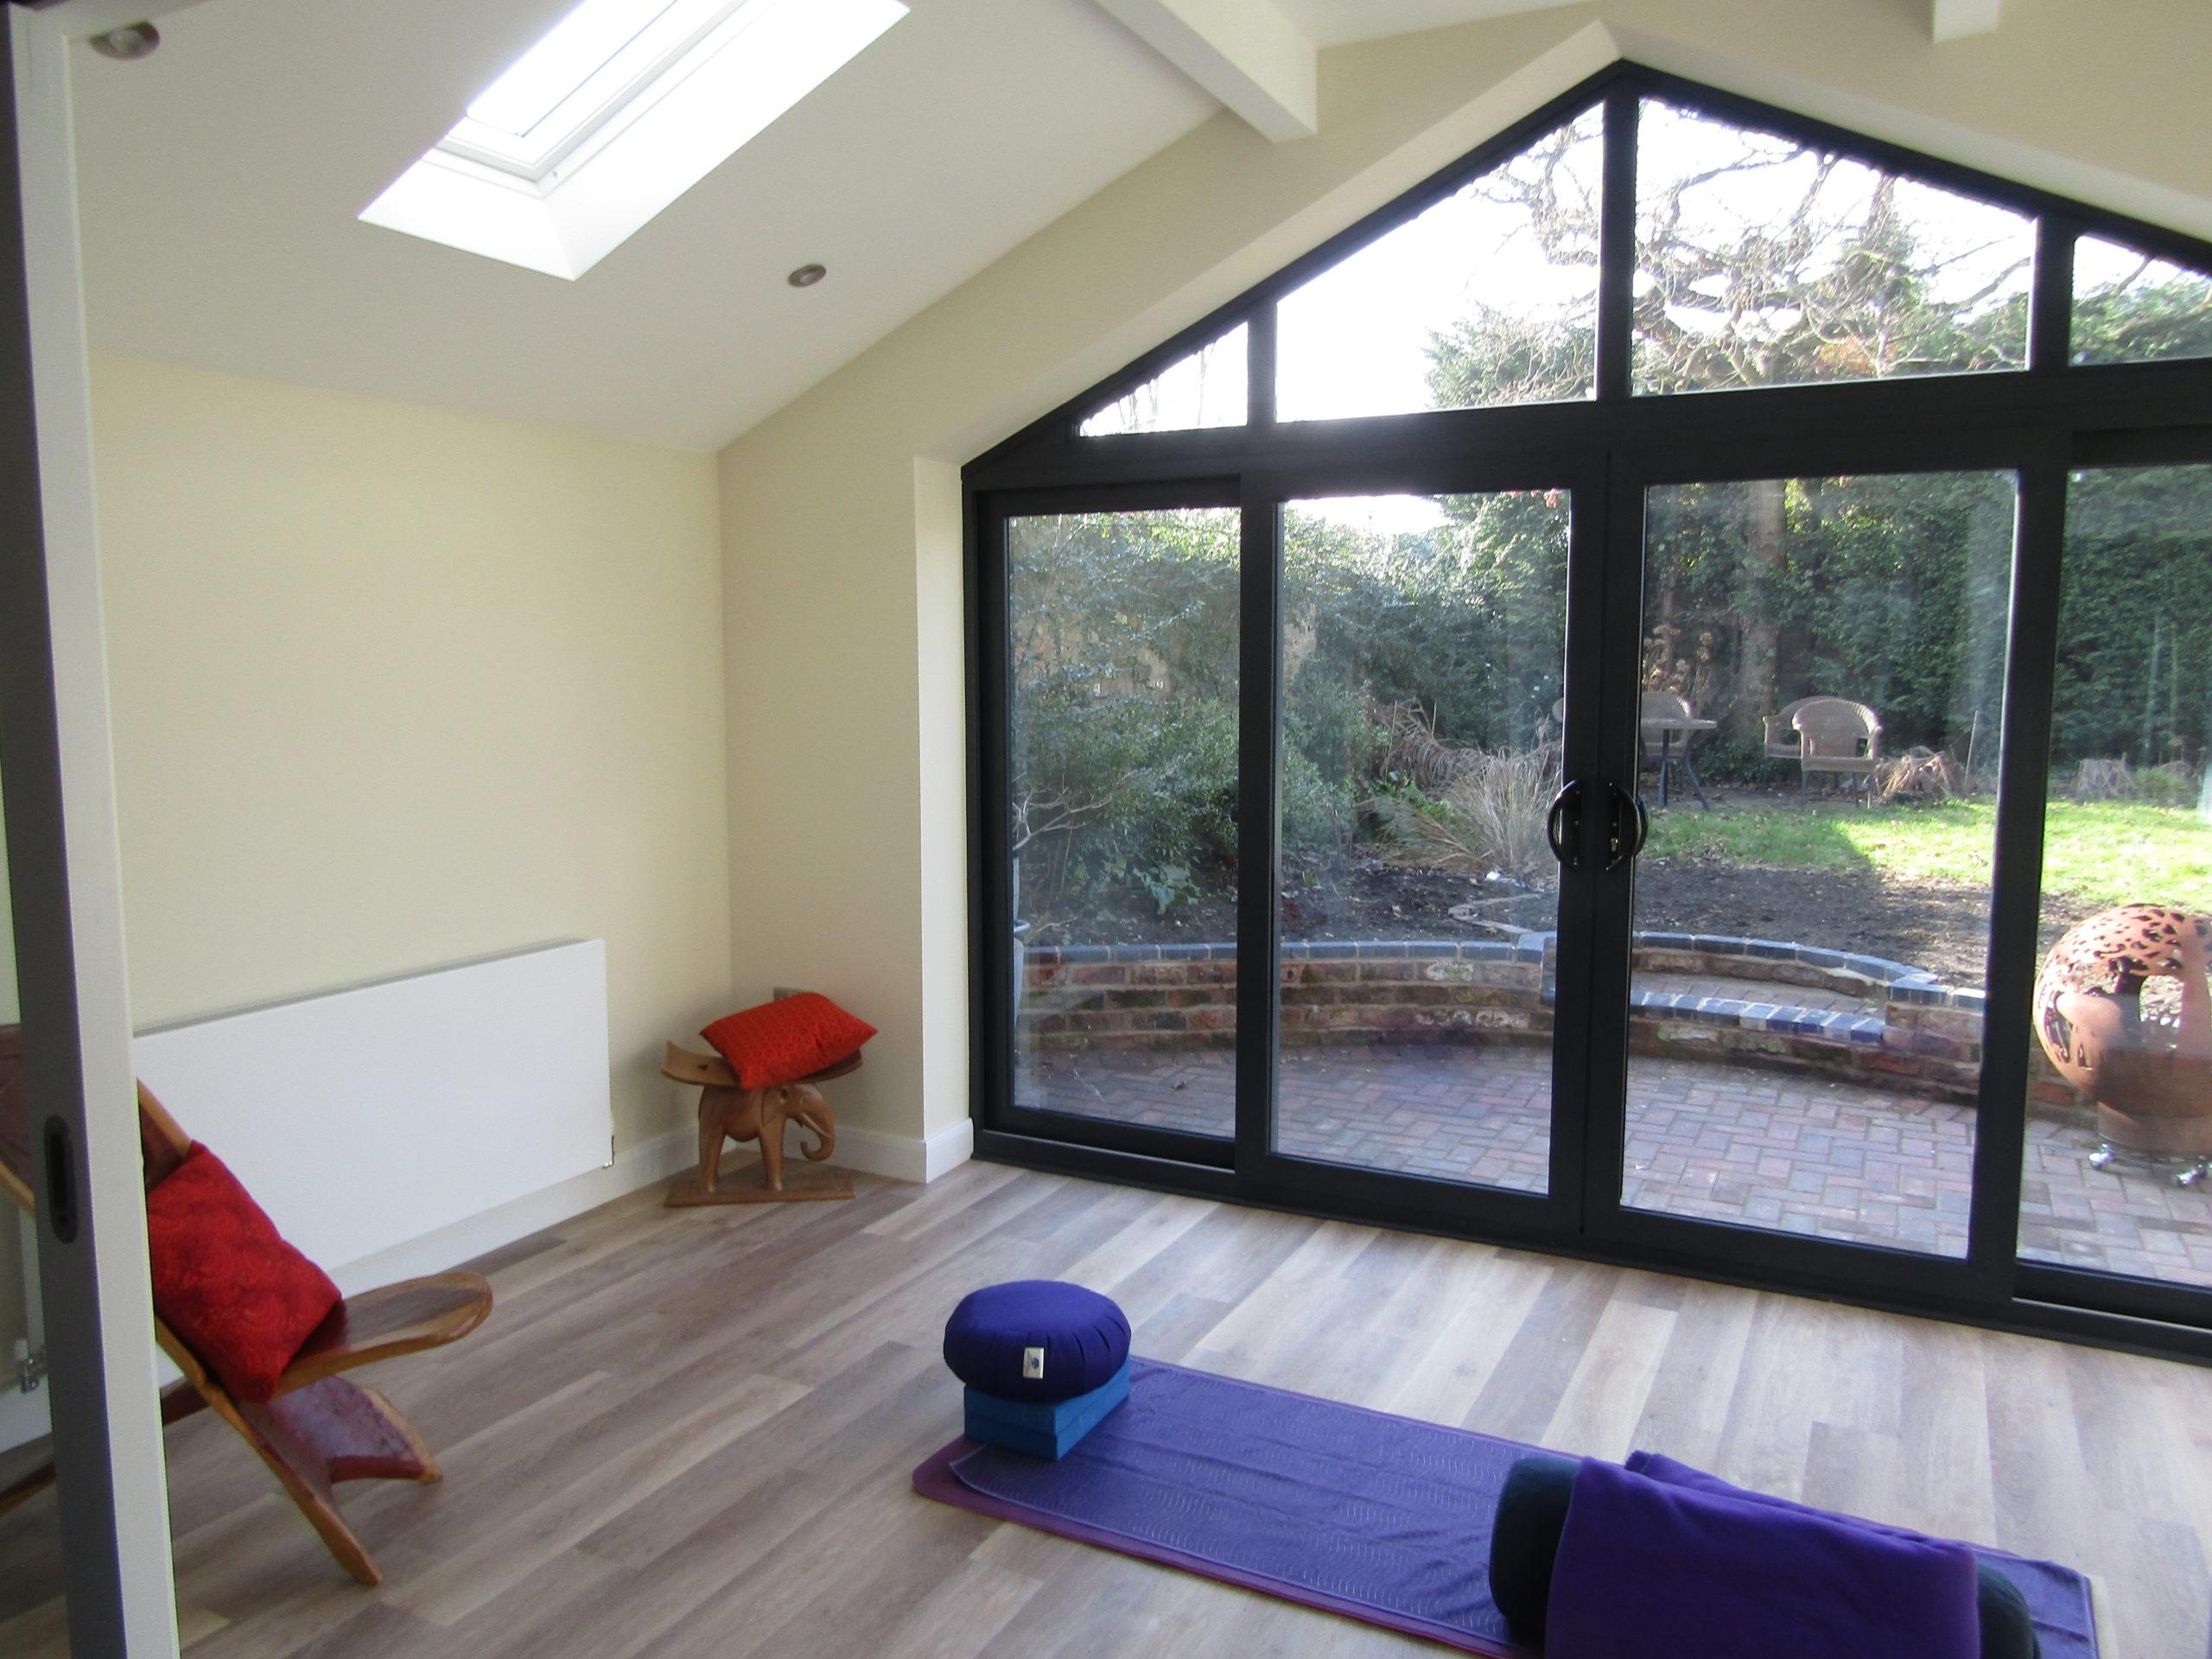 Yoga mat and block inside garage conversion